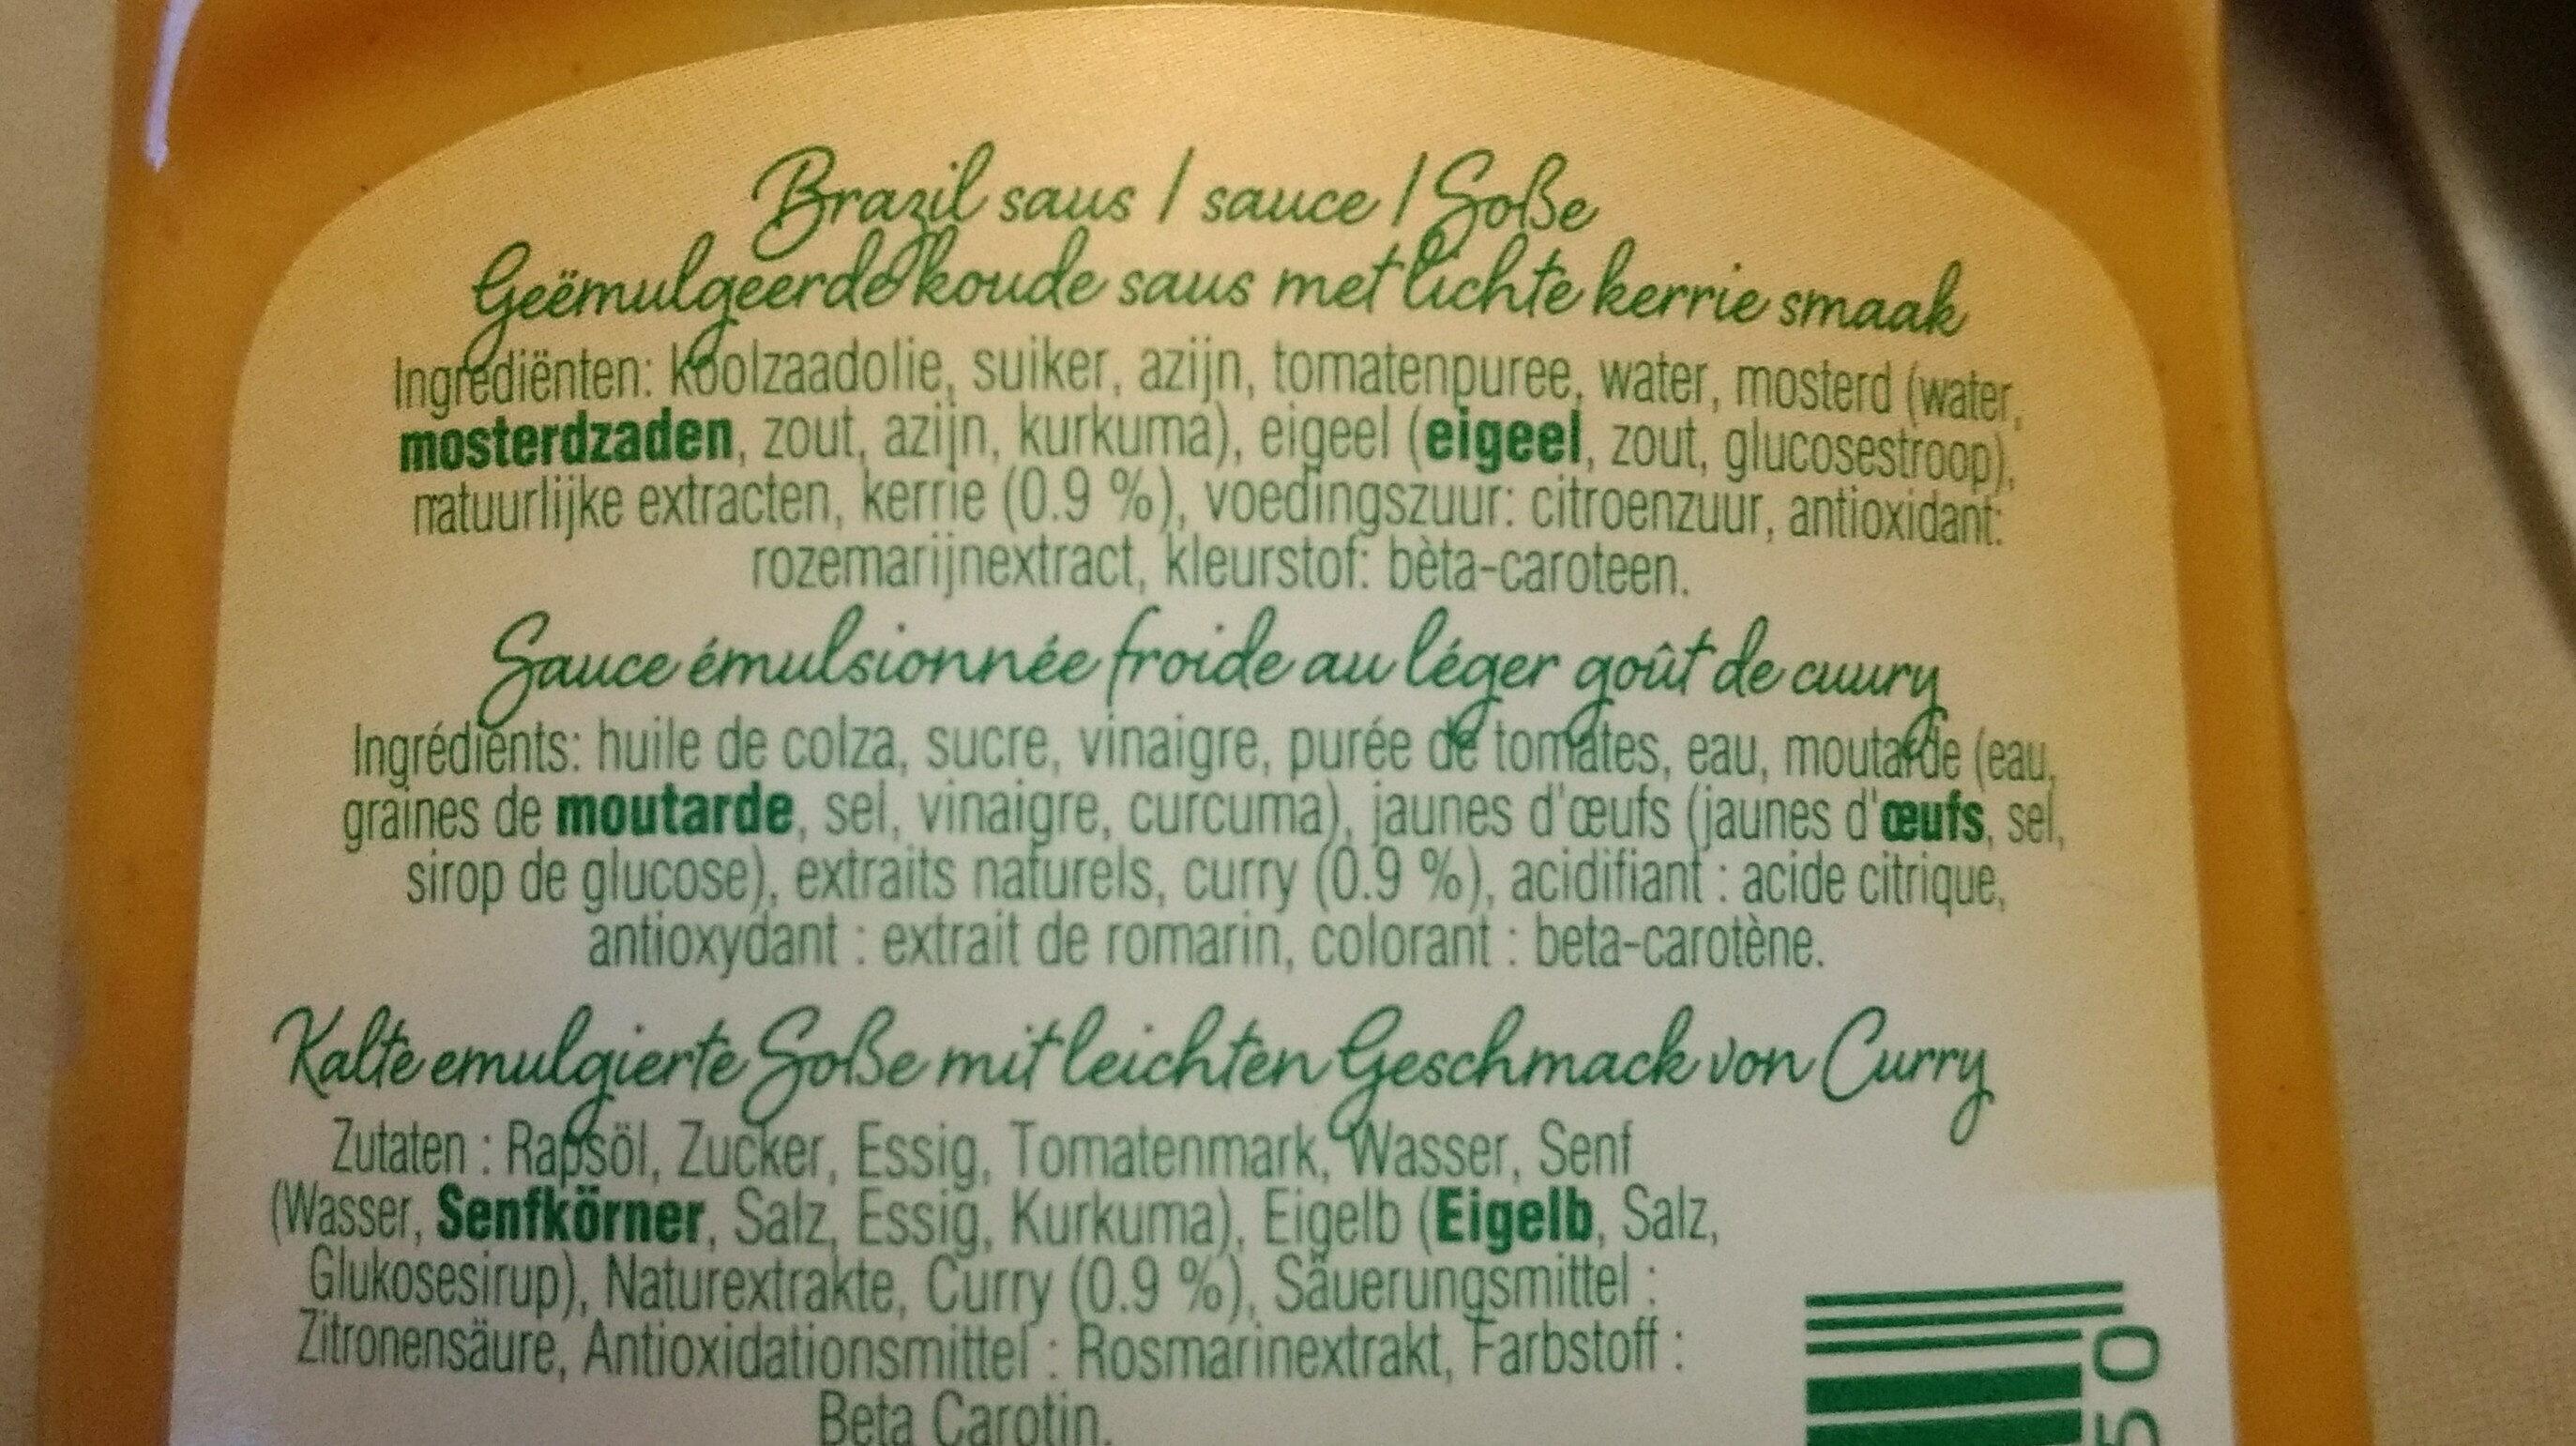 SAUCE BRAZIL - Ingredients - fr